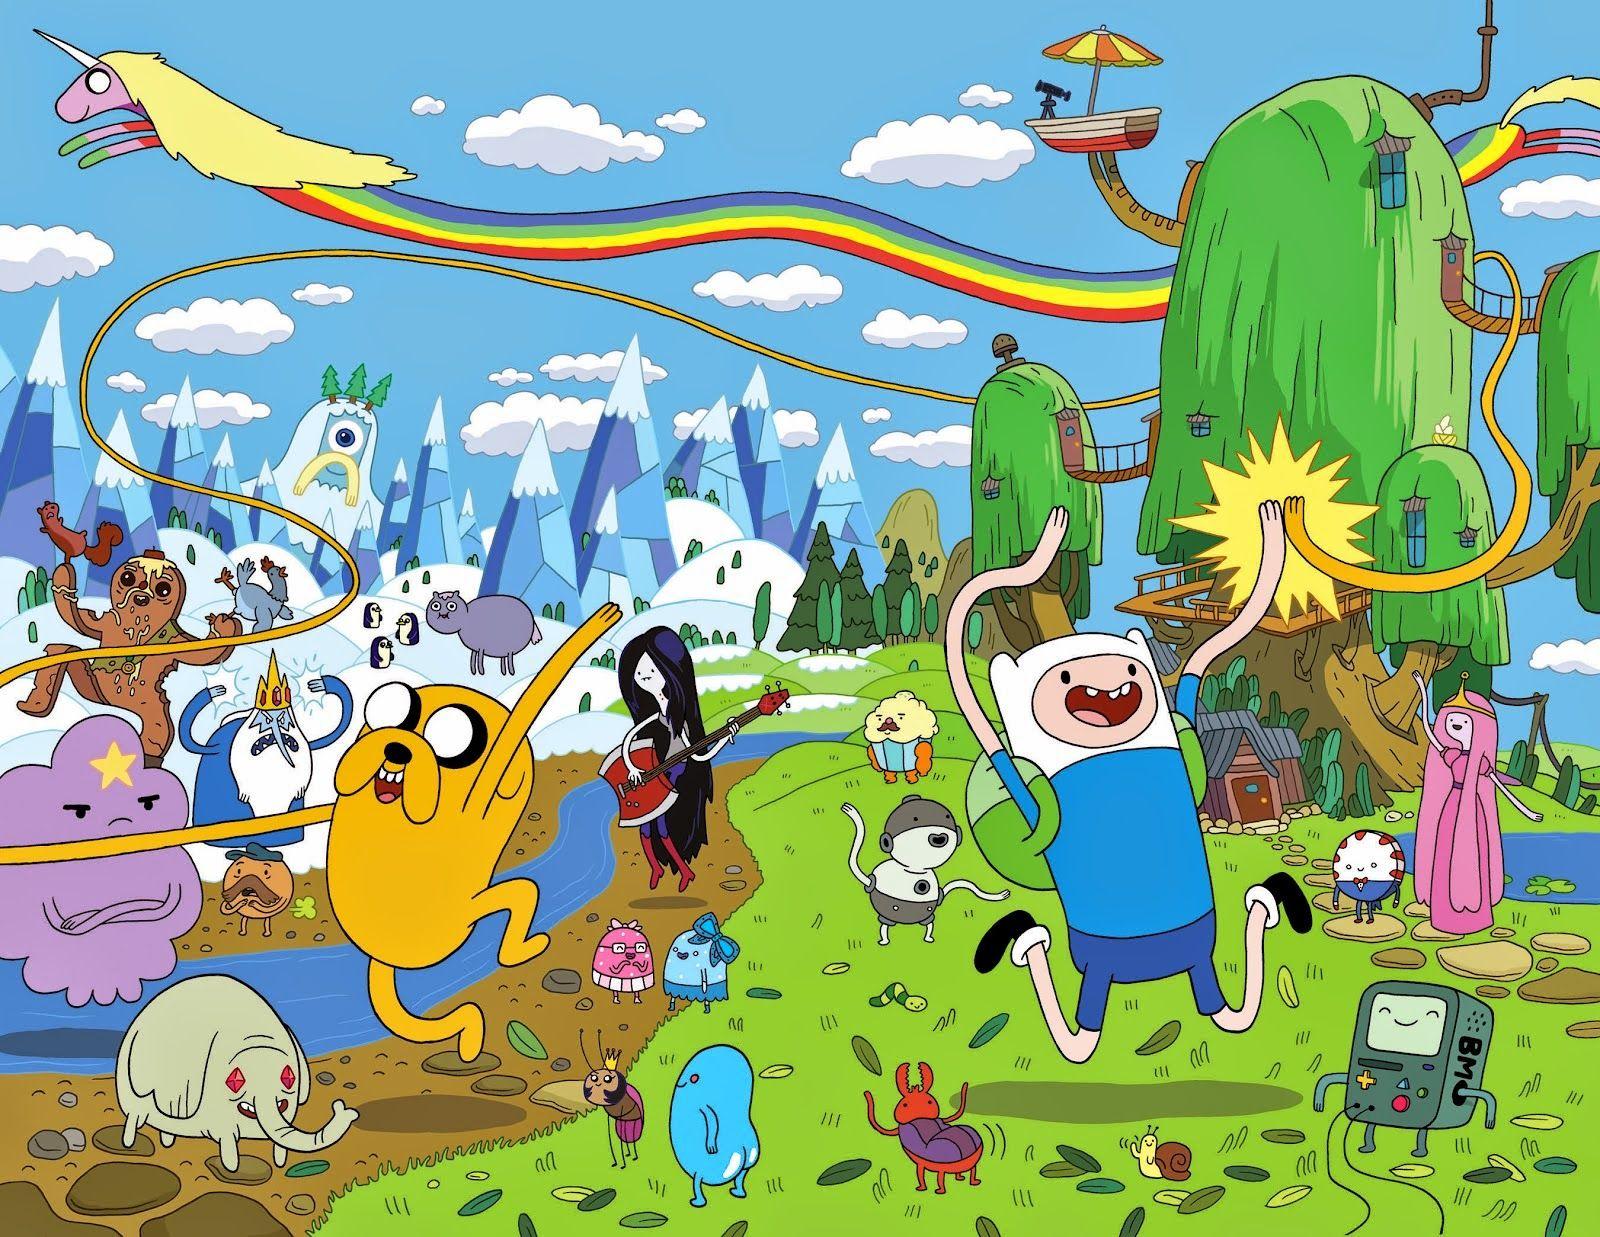 Series Online Latino Hora De Aventura Adventure Time Latino Espanol Descargar Hd Adventure Time Personajes Cumpleanos De Adventure Time Adventure Time